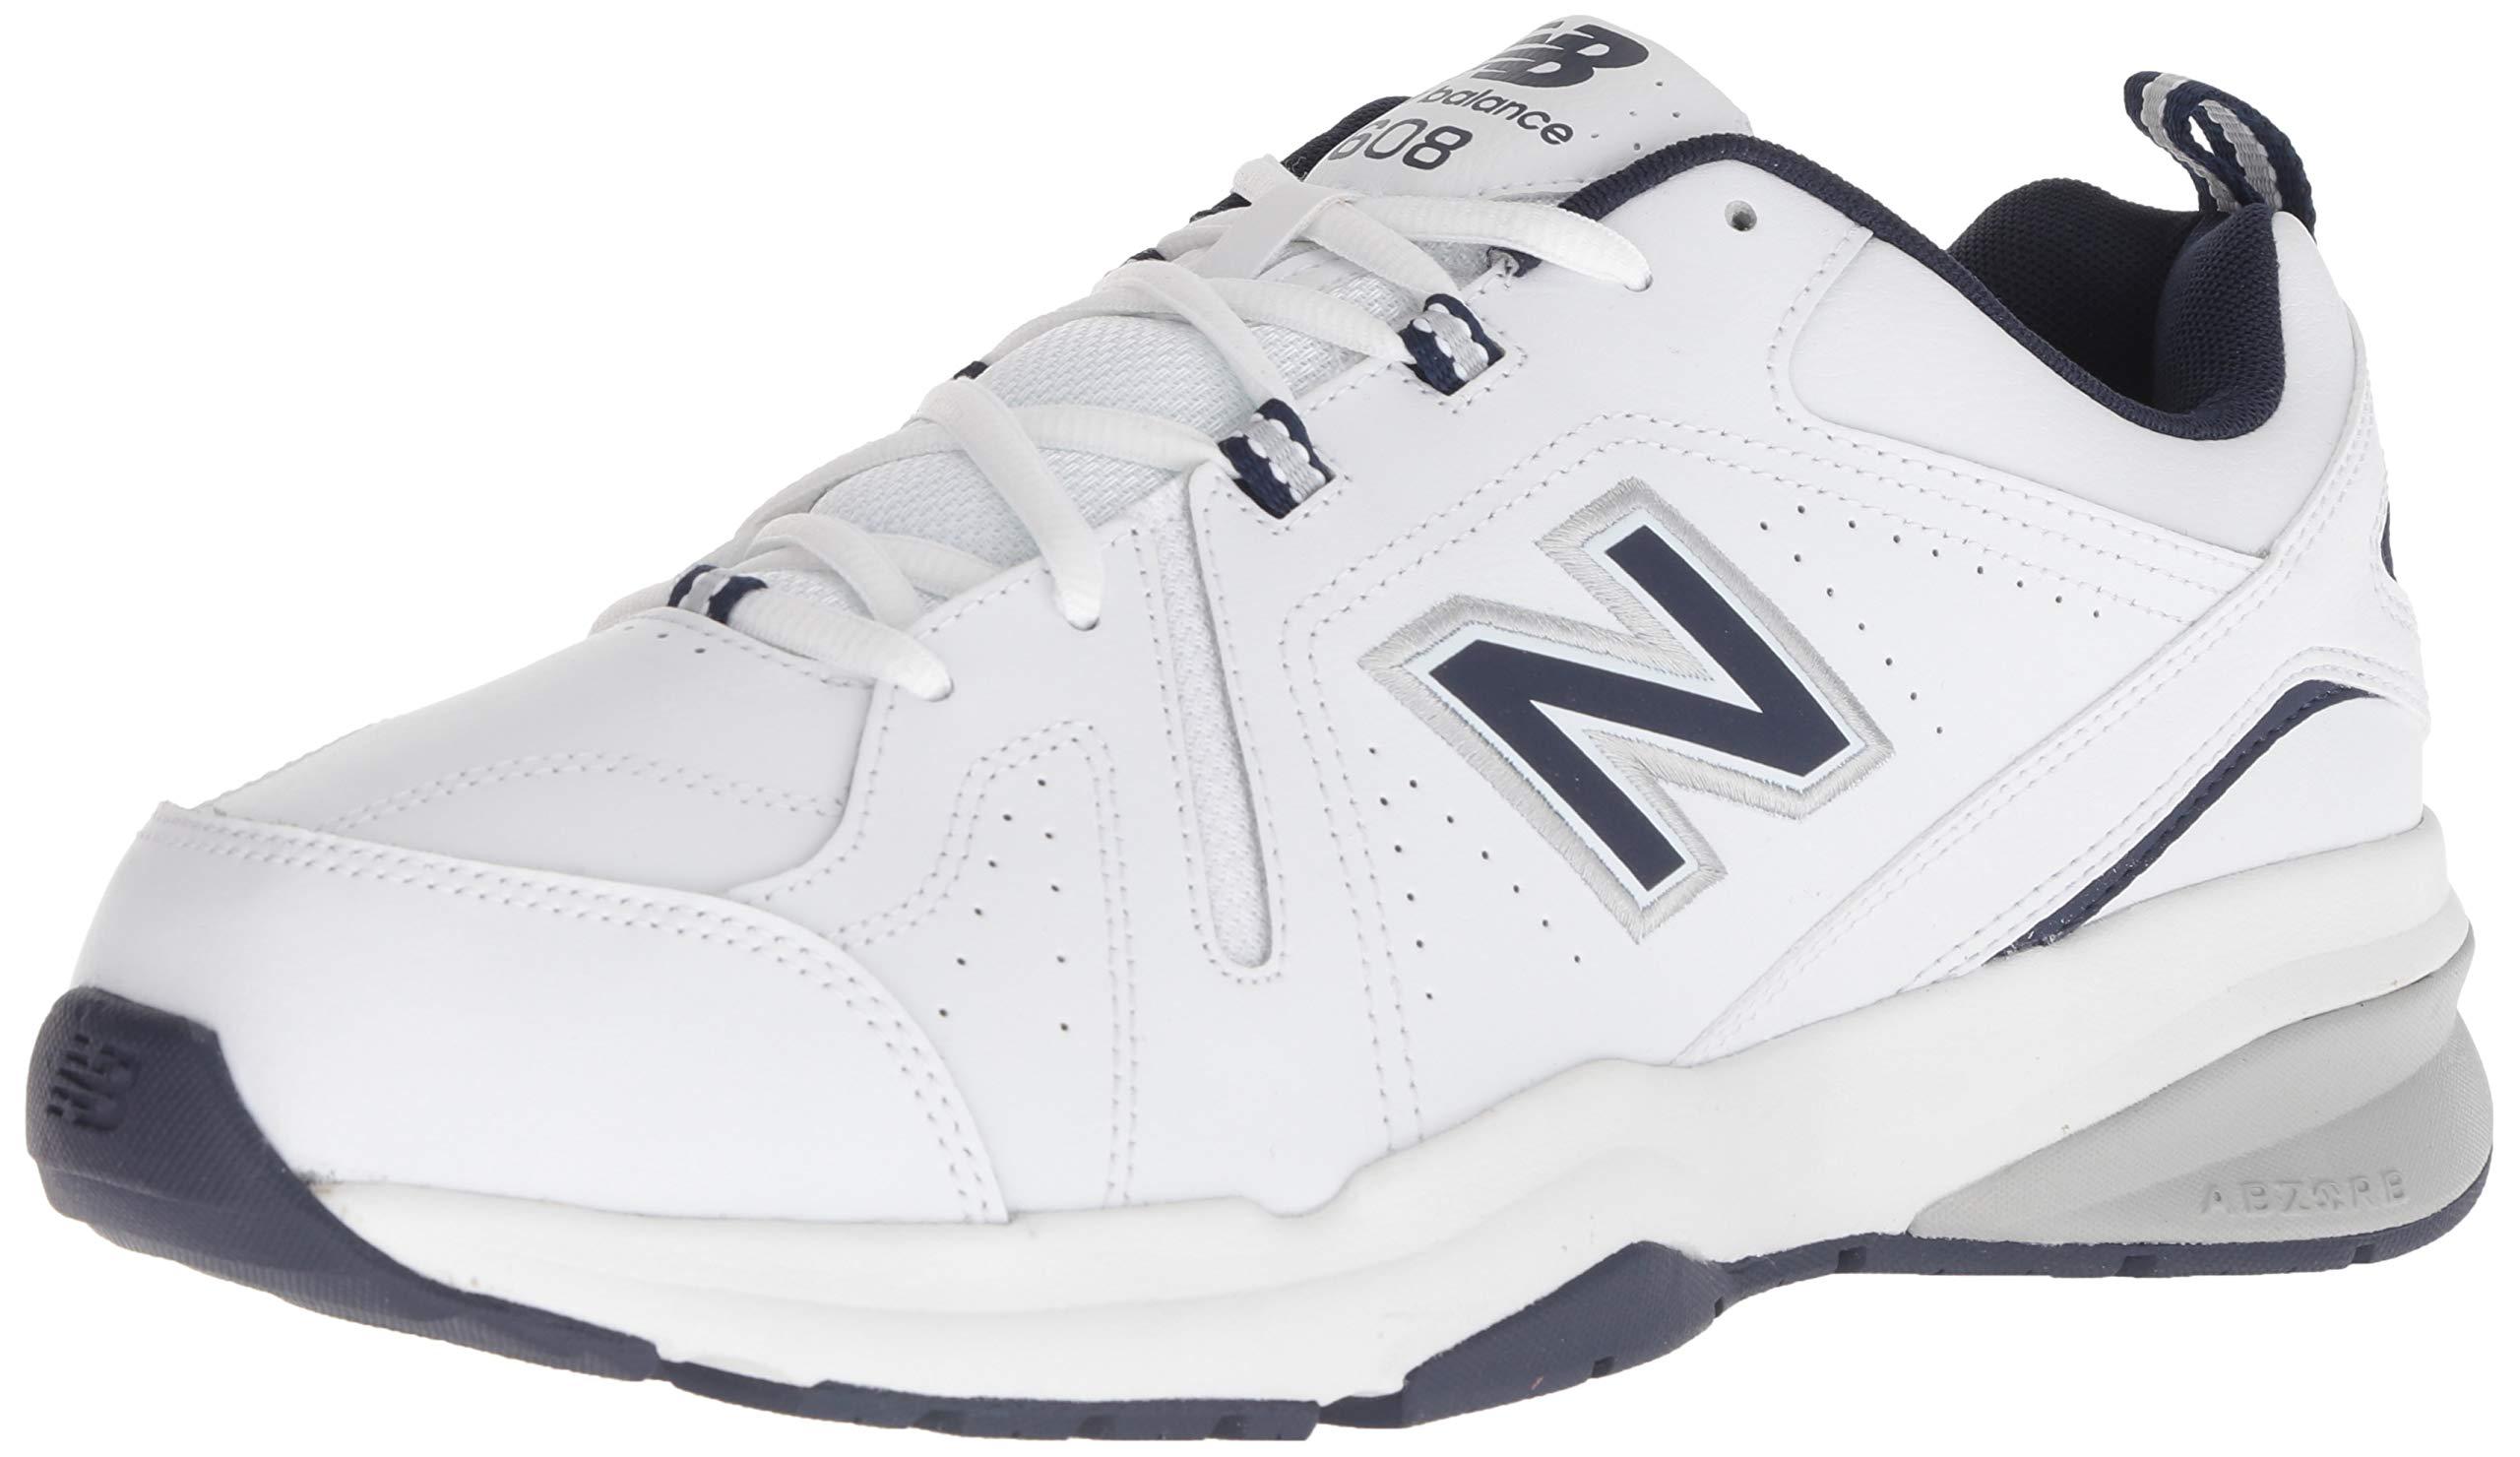 New Balance Men's 608v5 Casual Comfort Cross Trainer, White/Navy, 10.5 4E US by New Balance